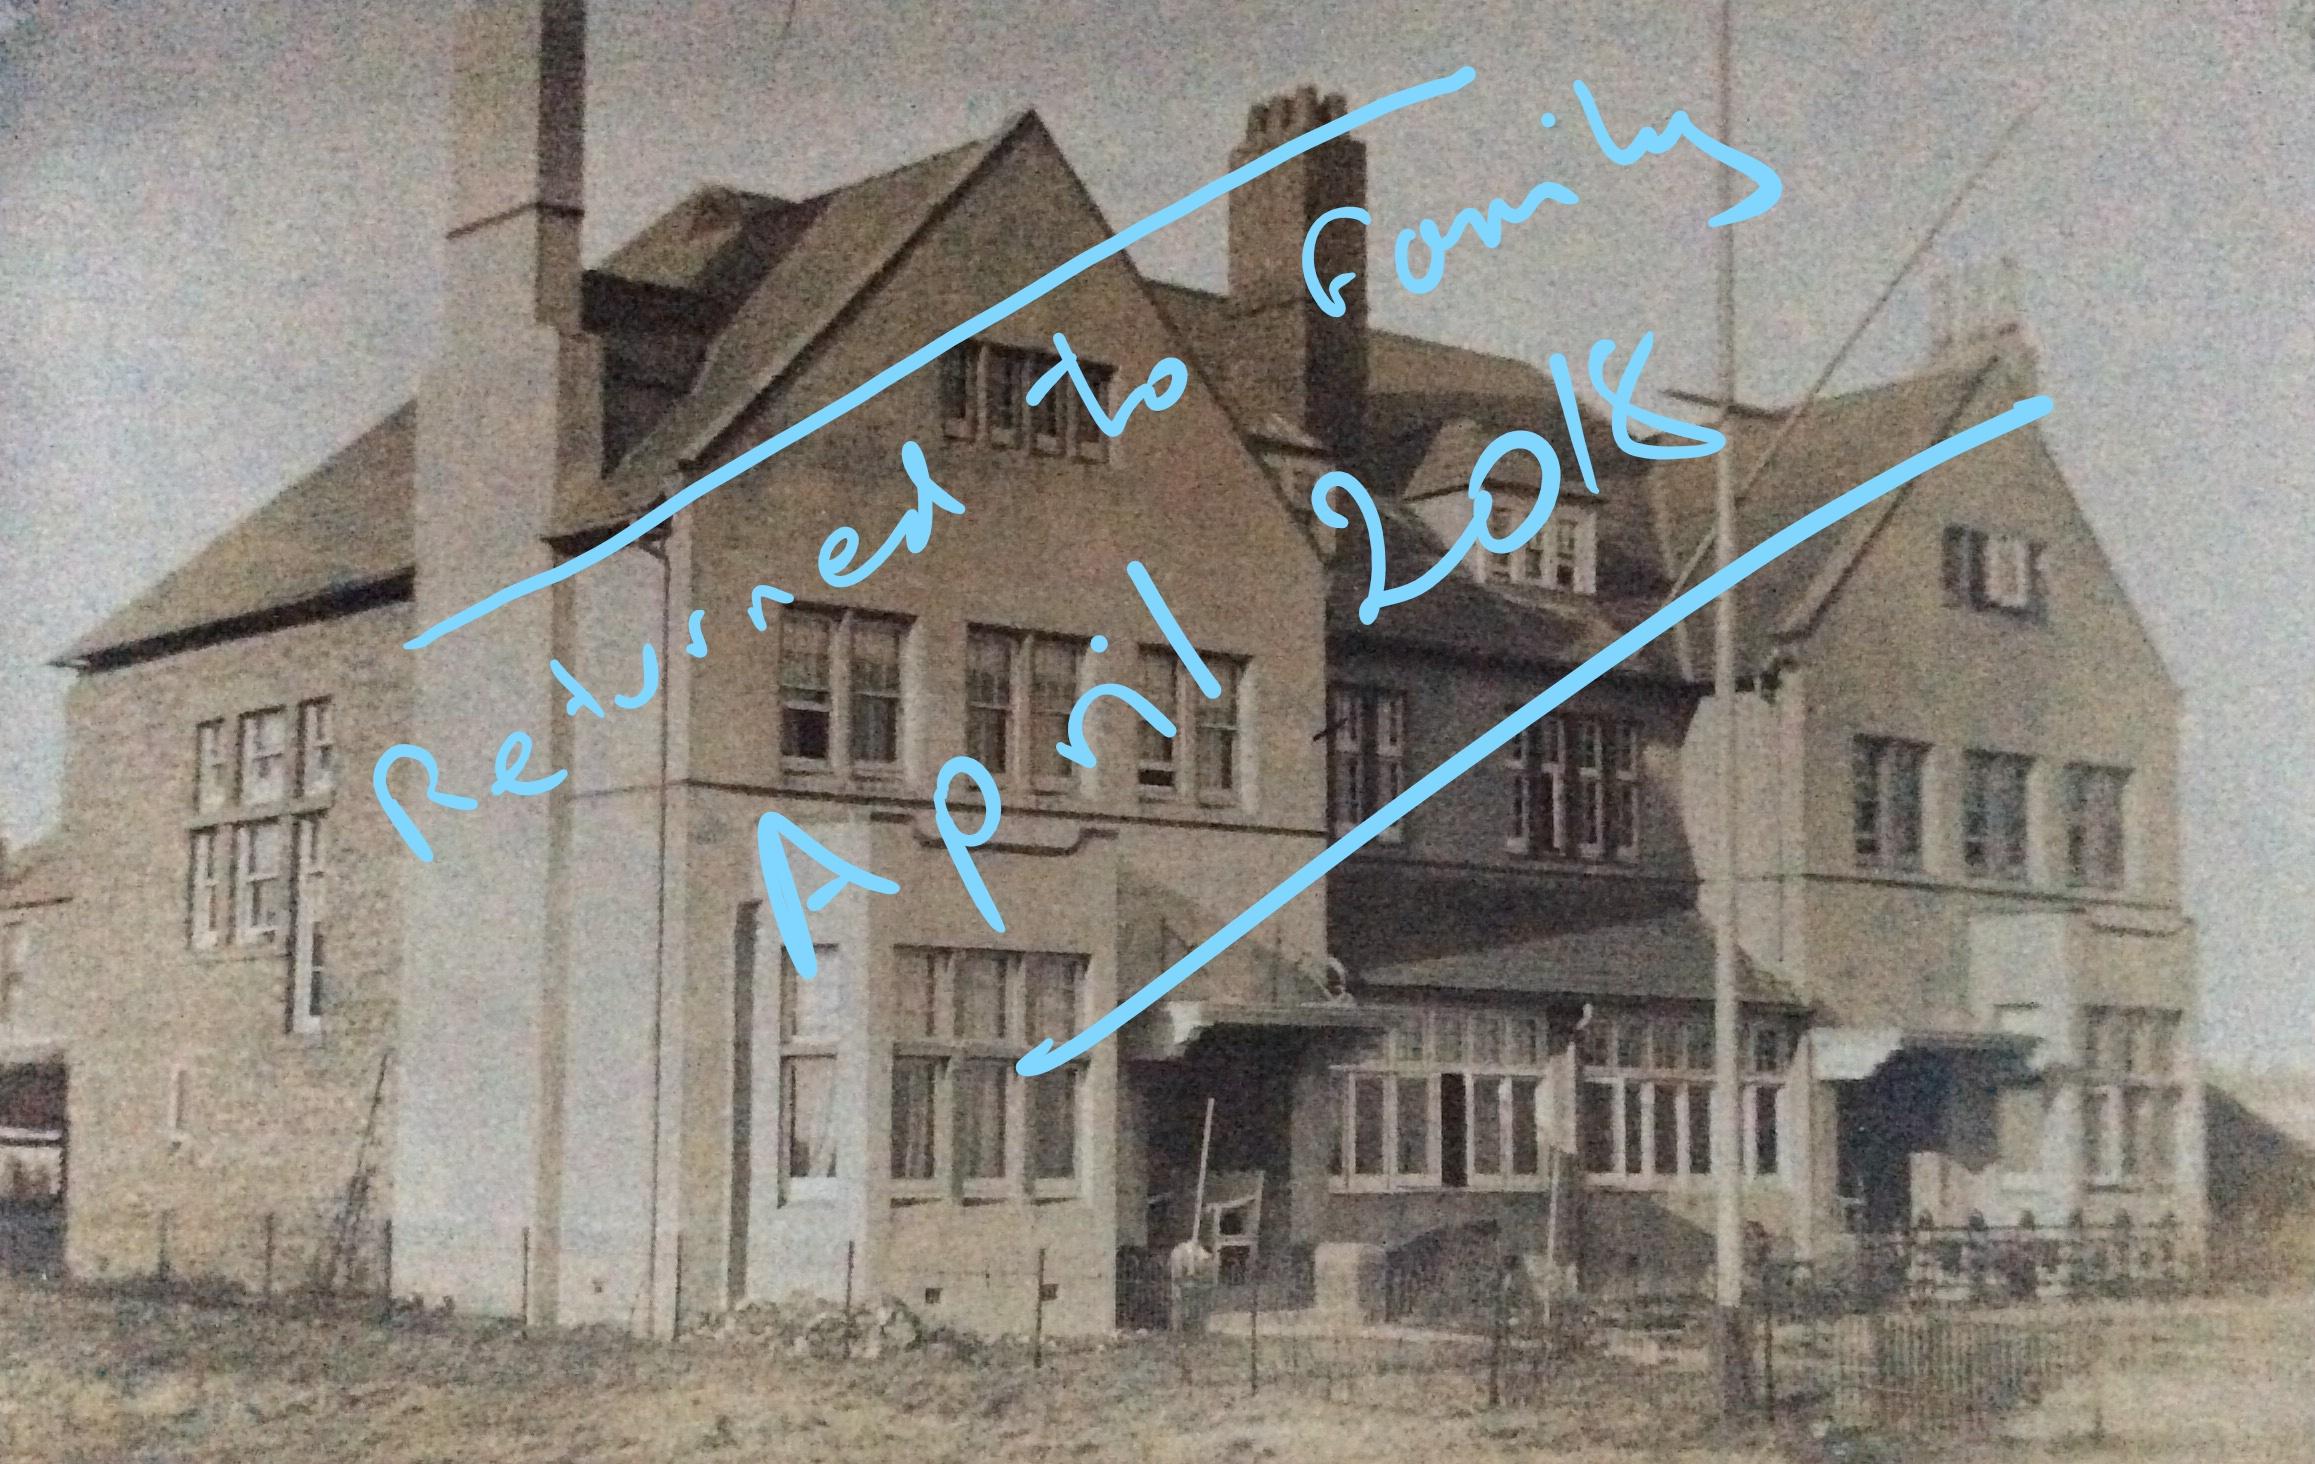 1905 March 20 Hope you got back safely